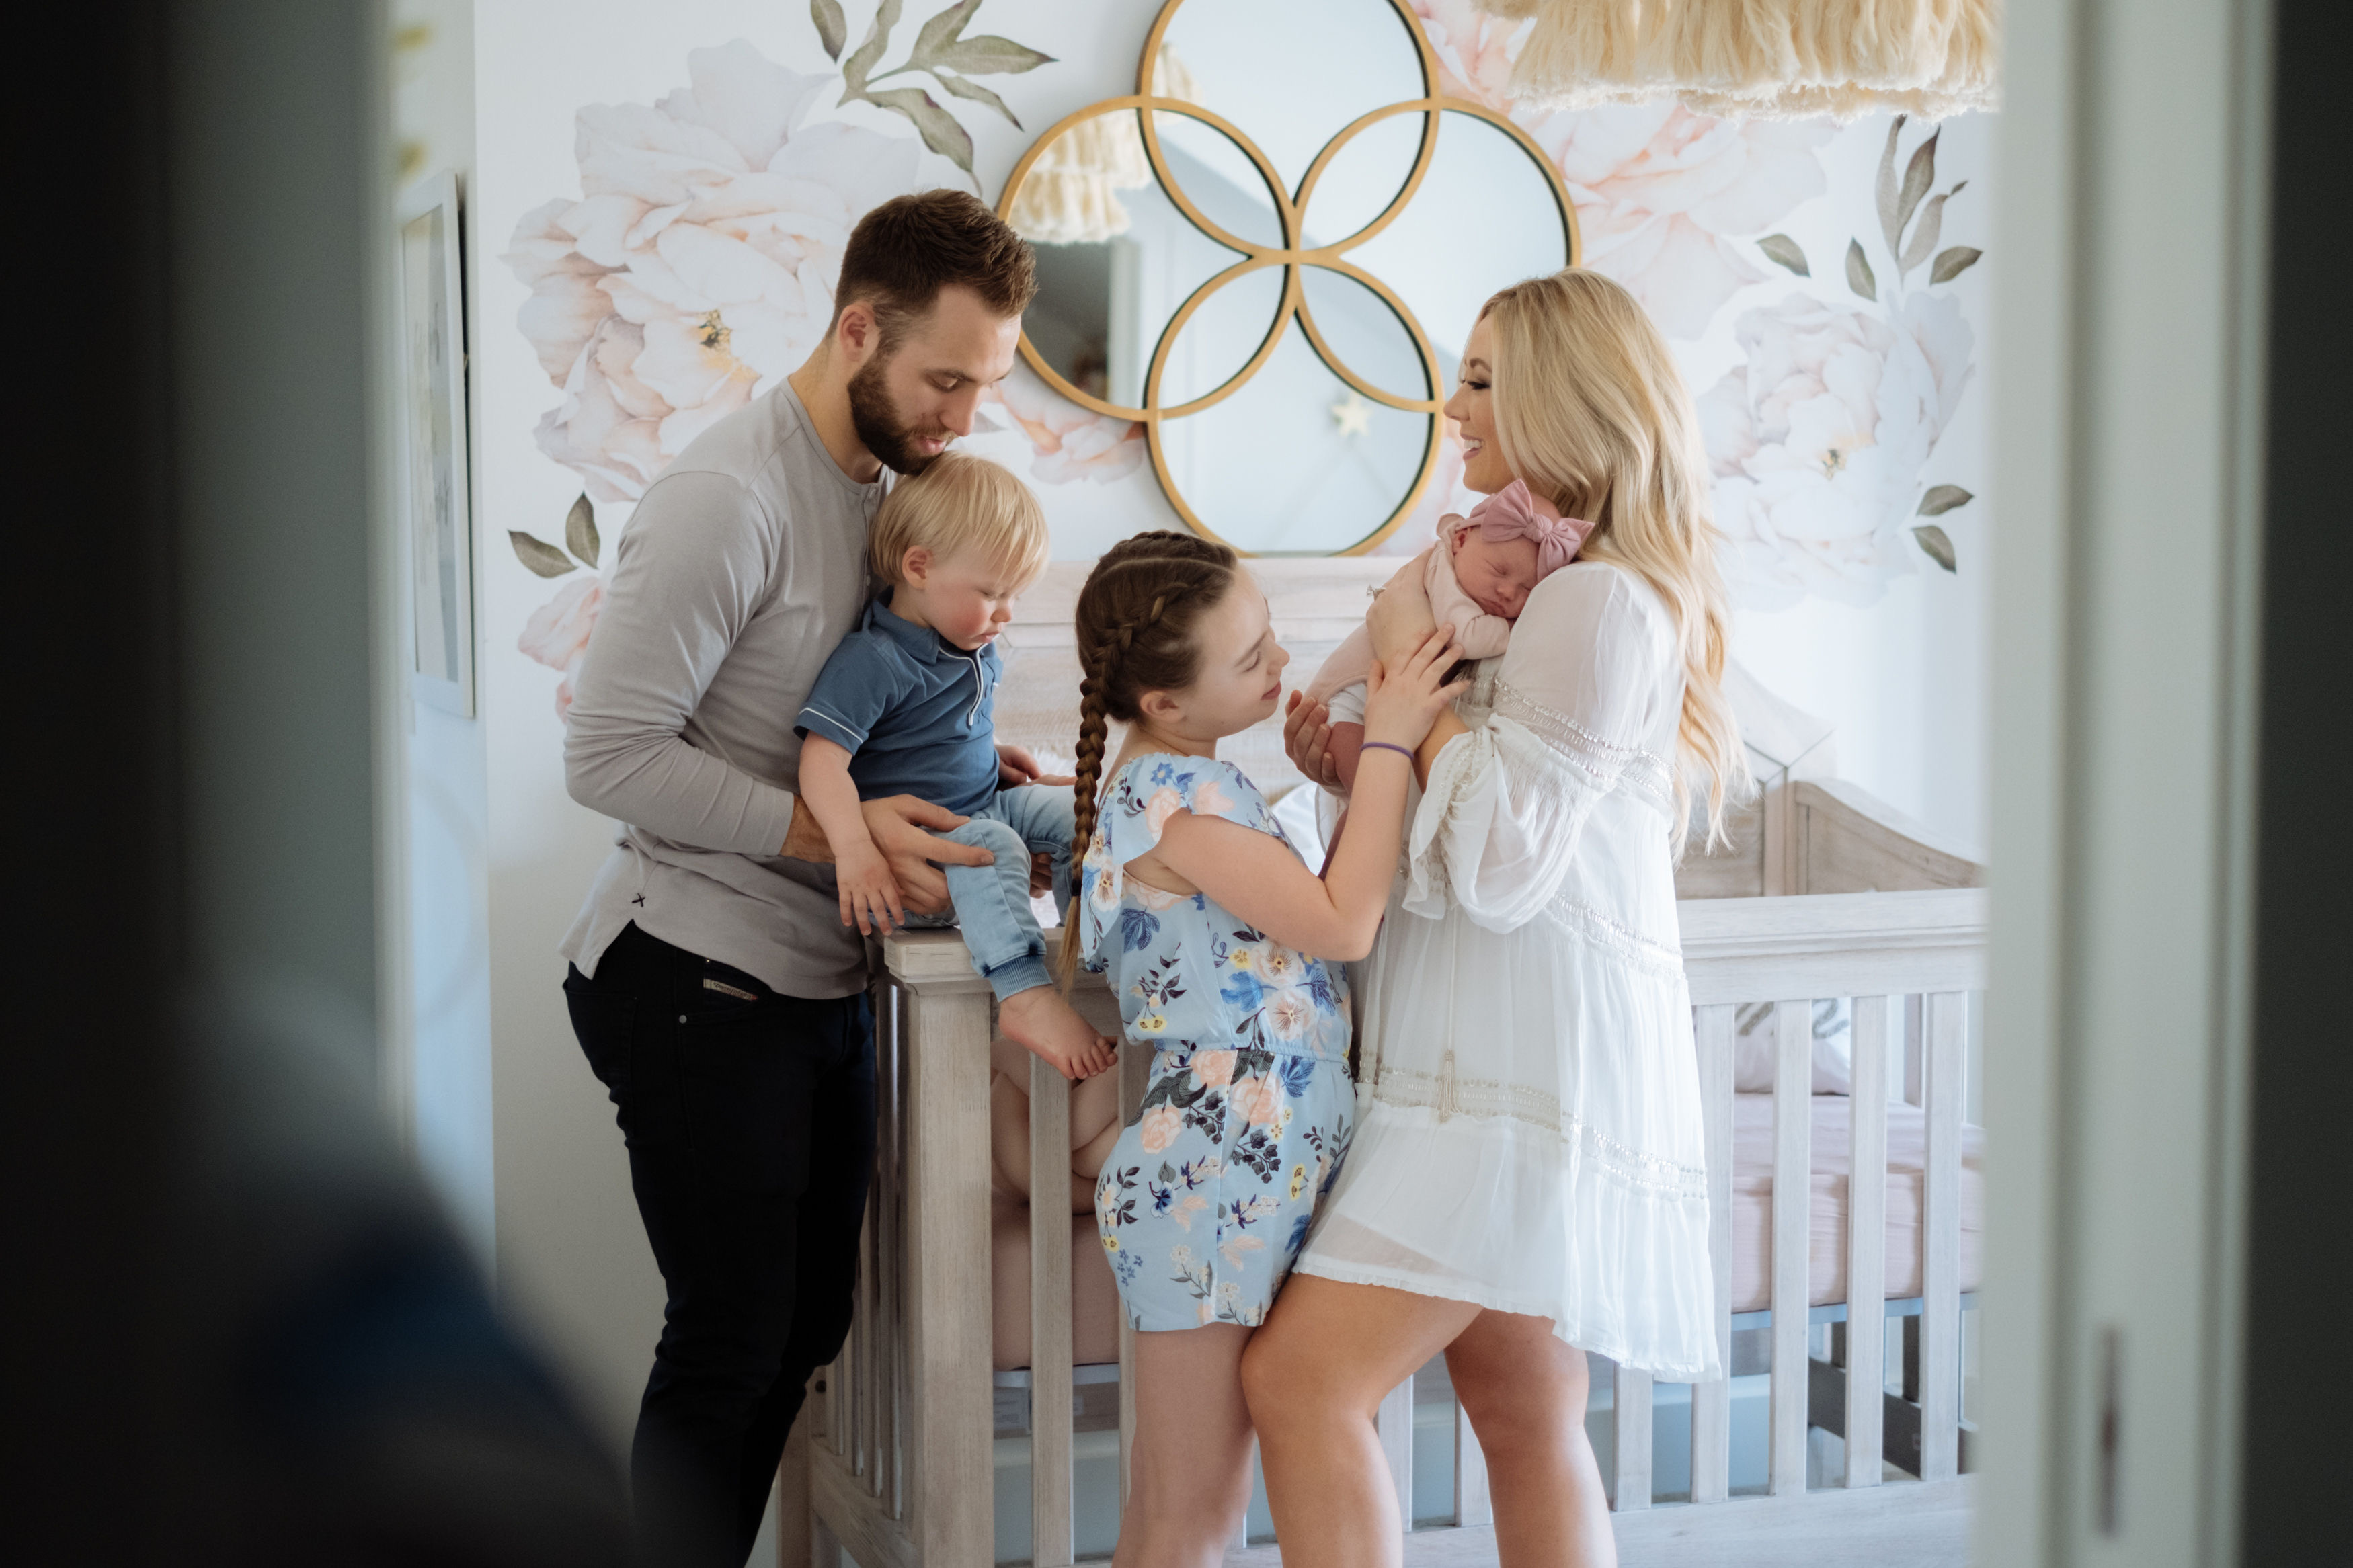 Carly Zucker with Jason Zucker and family